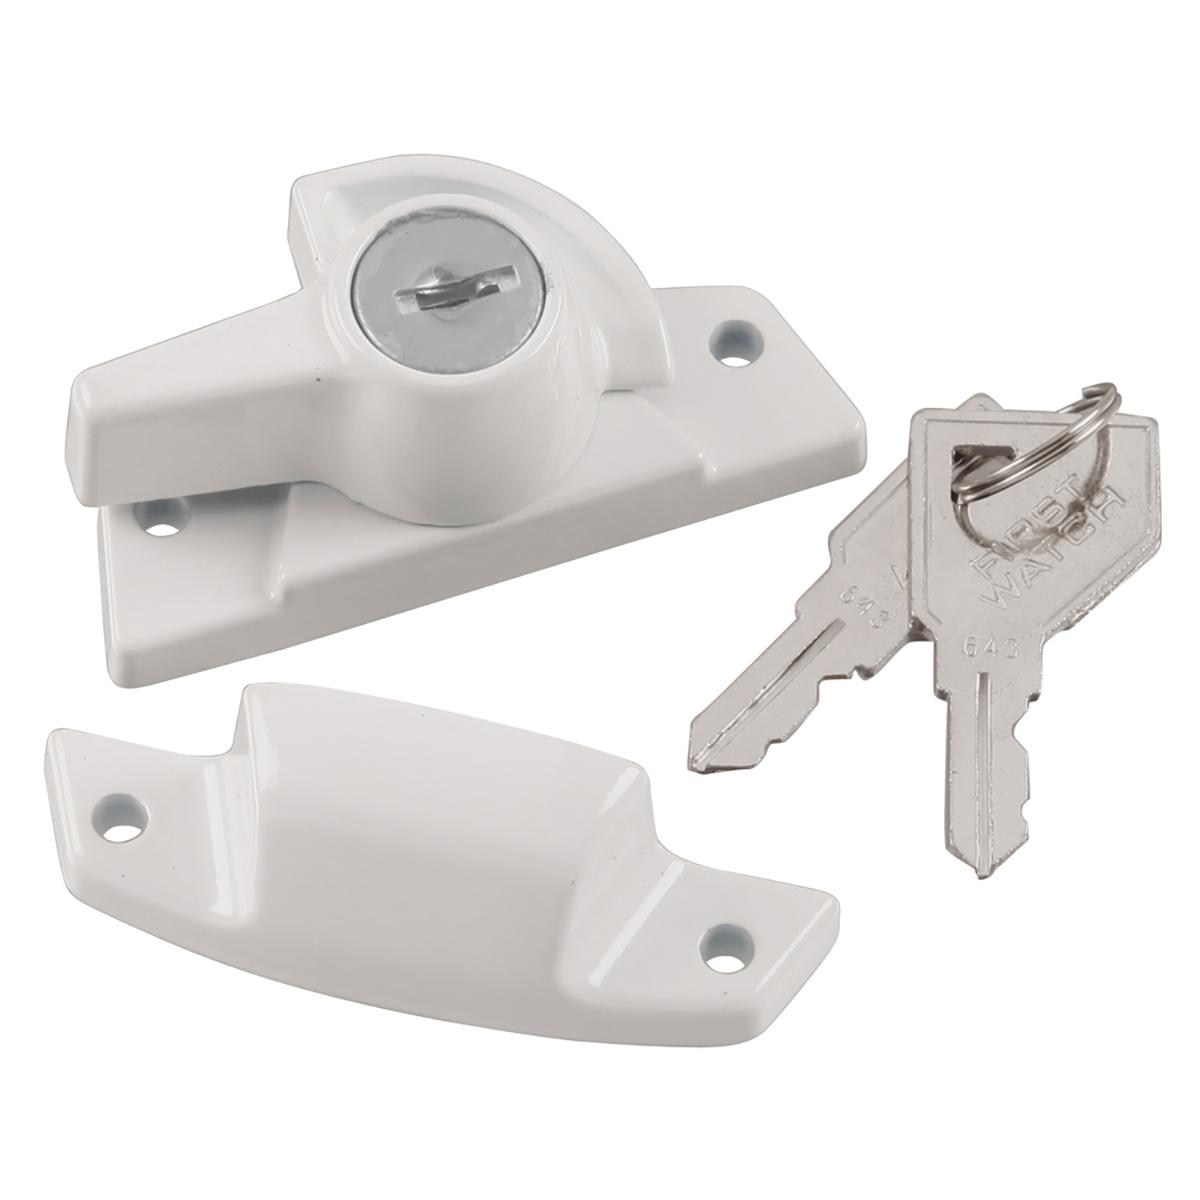 Keyed Sash Lock First Watch Security